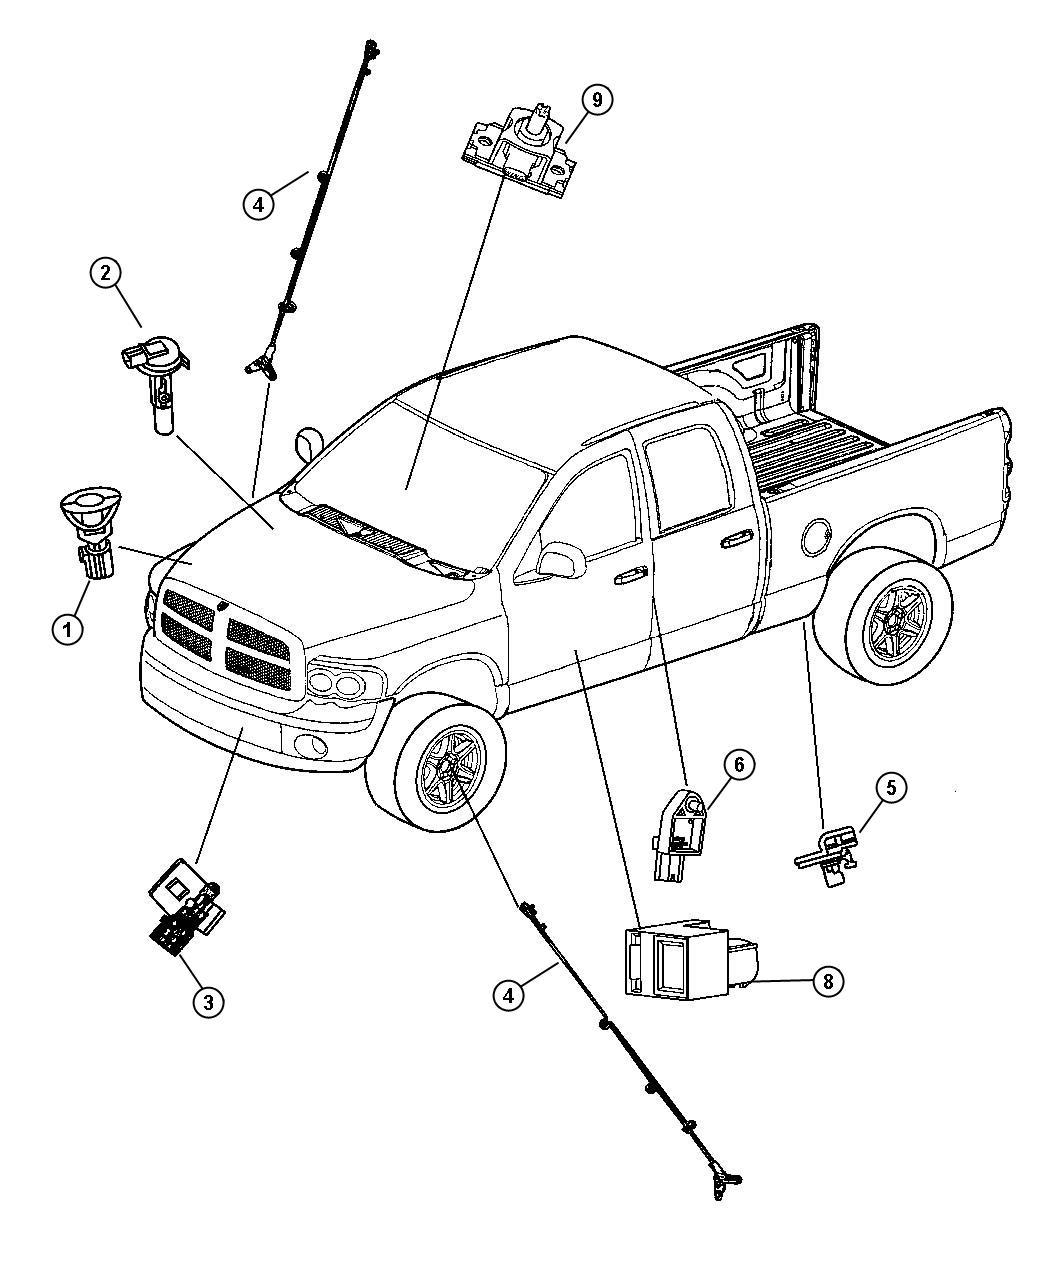 2009 Jeep Liberty Sensor, sensor kit. Strain gage, strain